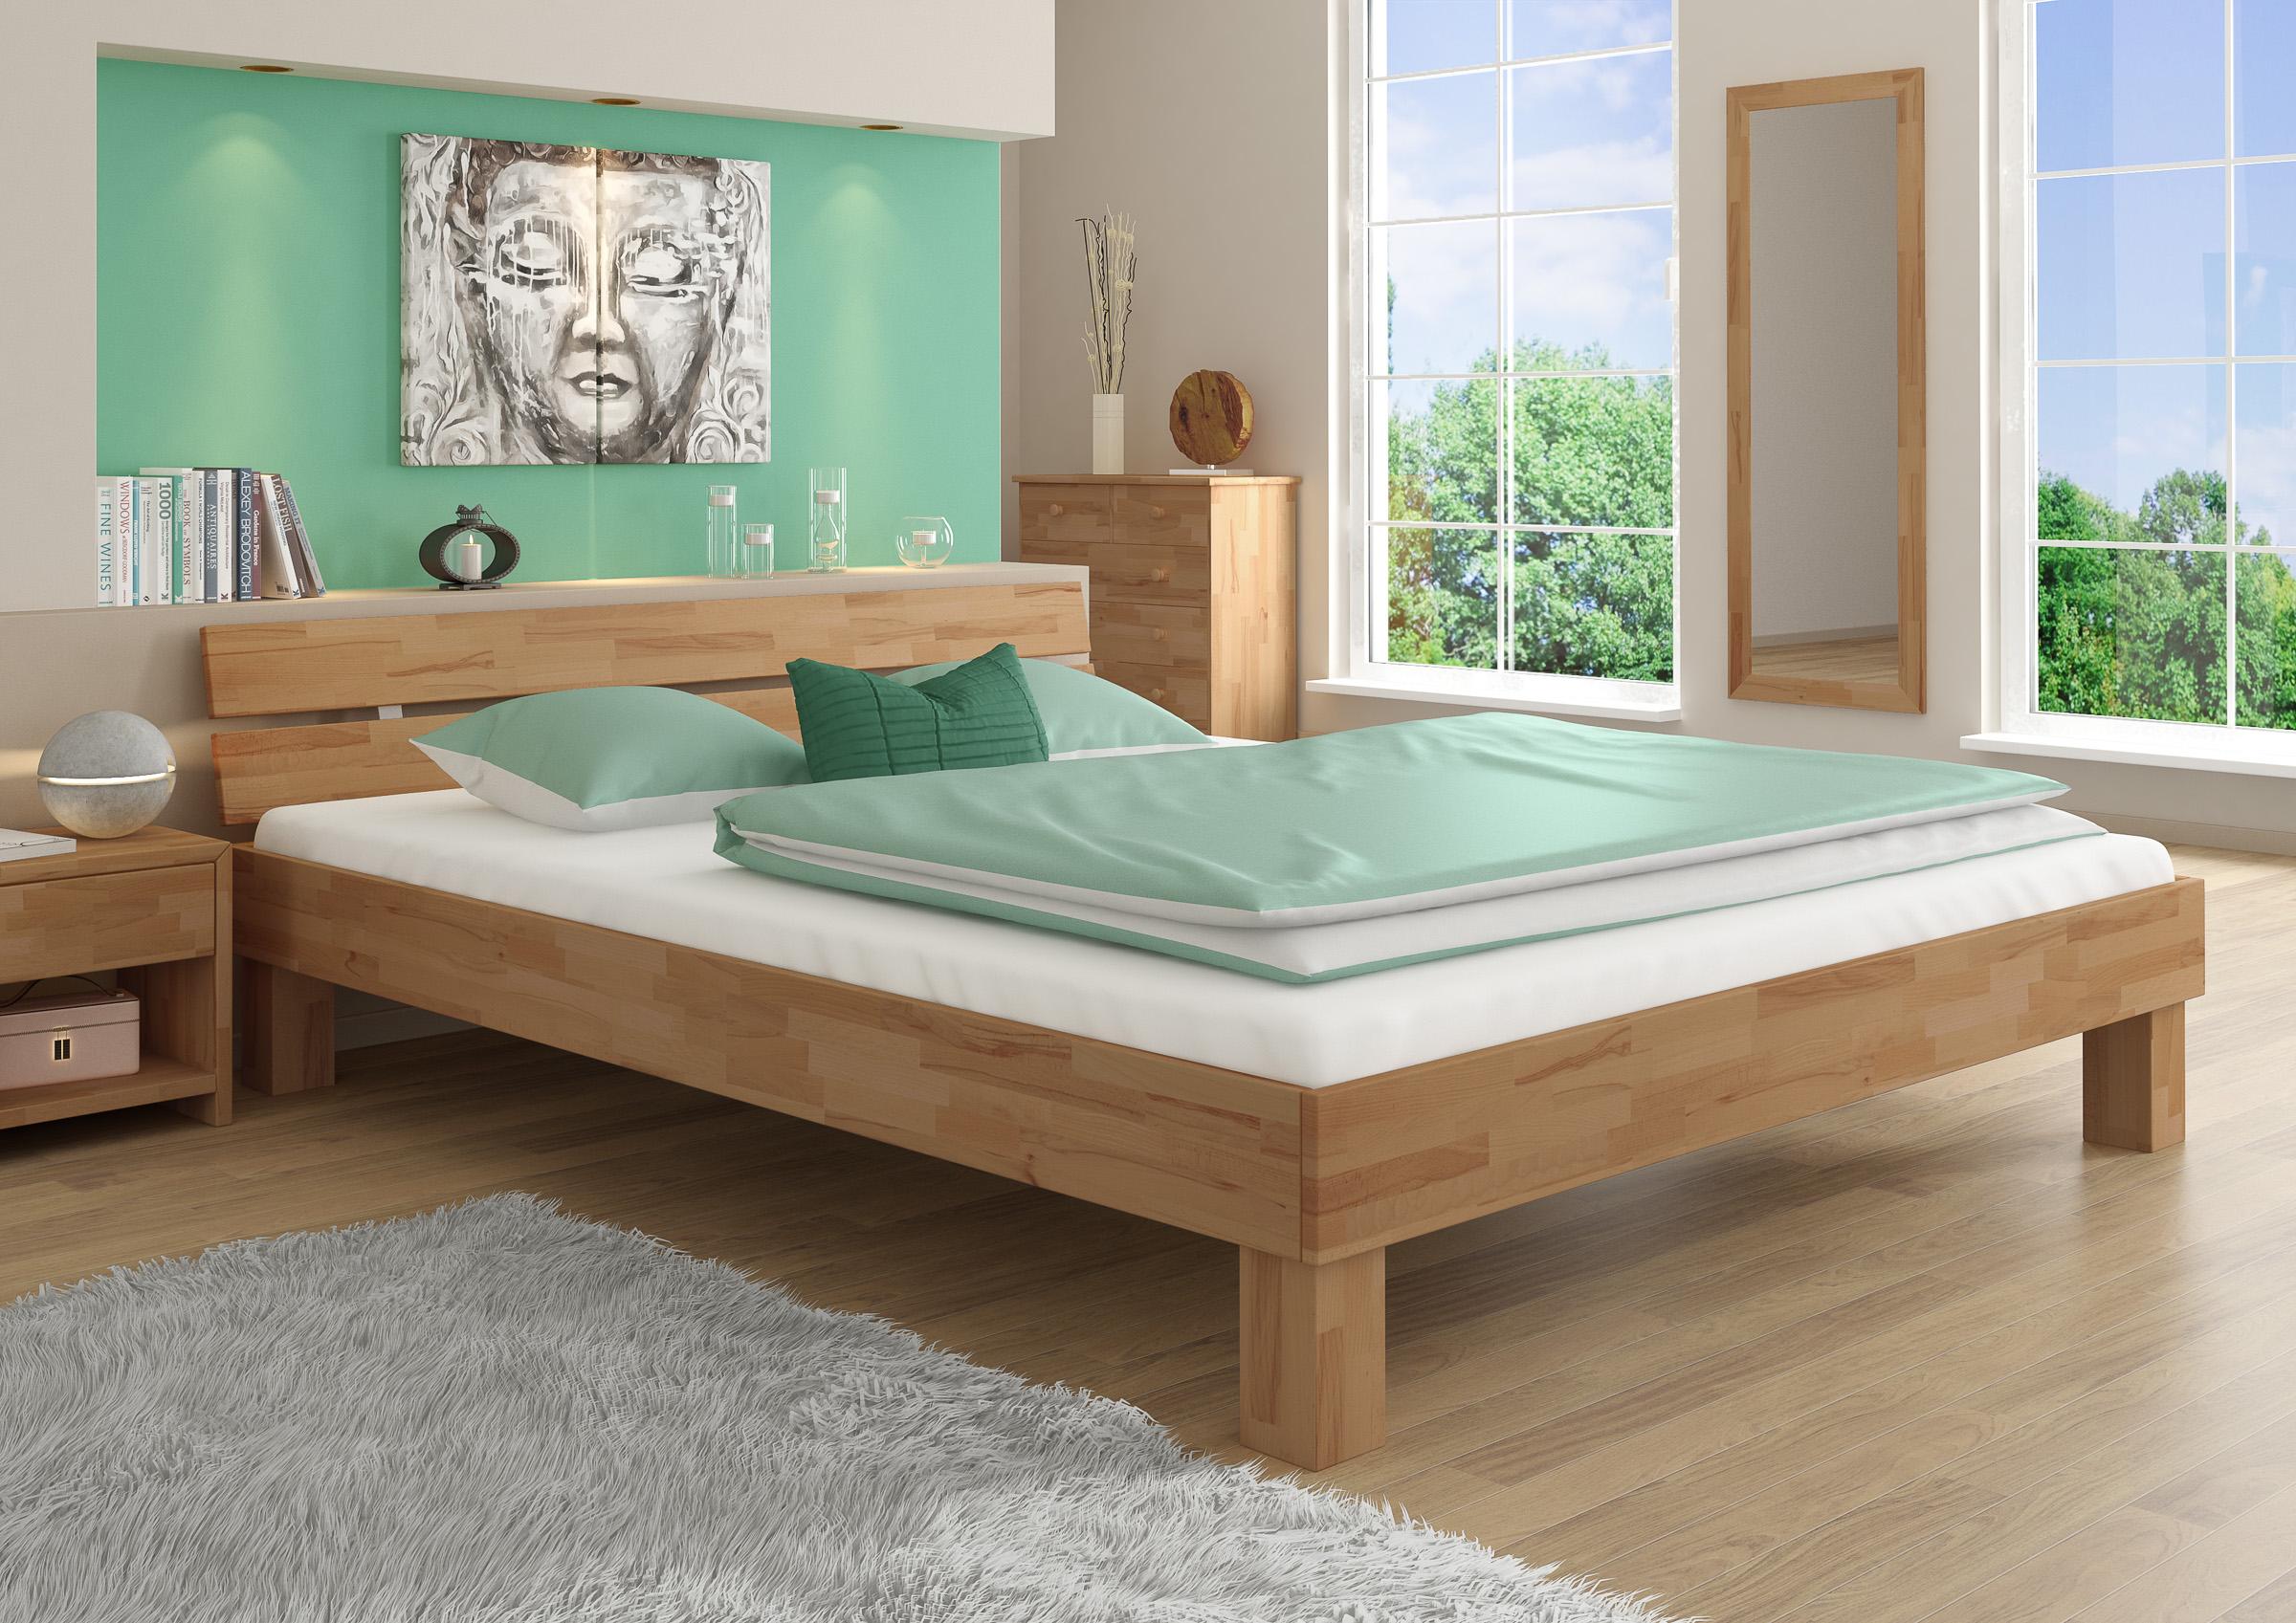 Full Size of Bett 180x200 Buche Massiv Gelt Doppelbett Lattenrost Matratzen Trends Betten überlänge 190x90 120x200 Breit Musterring Mit Beleuchtung Bettkasten 90x200 Bett Massiv Bett 180x200